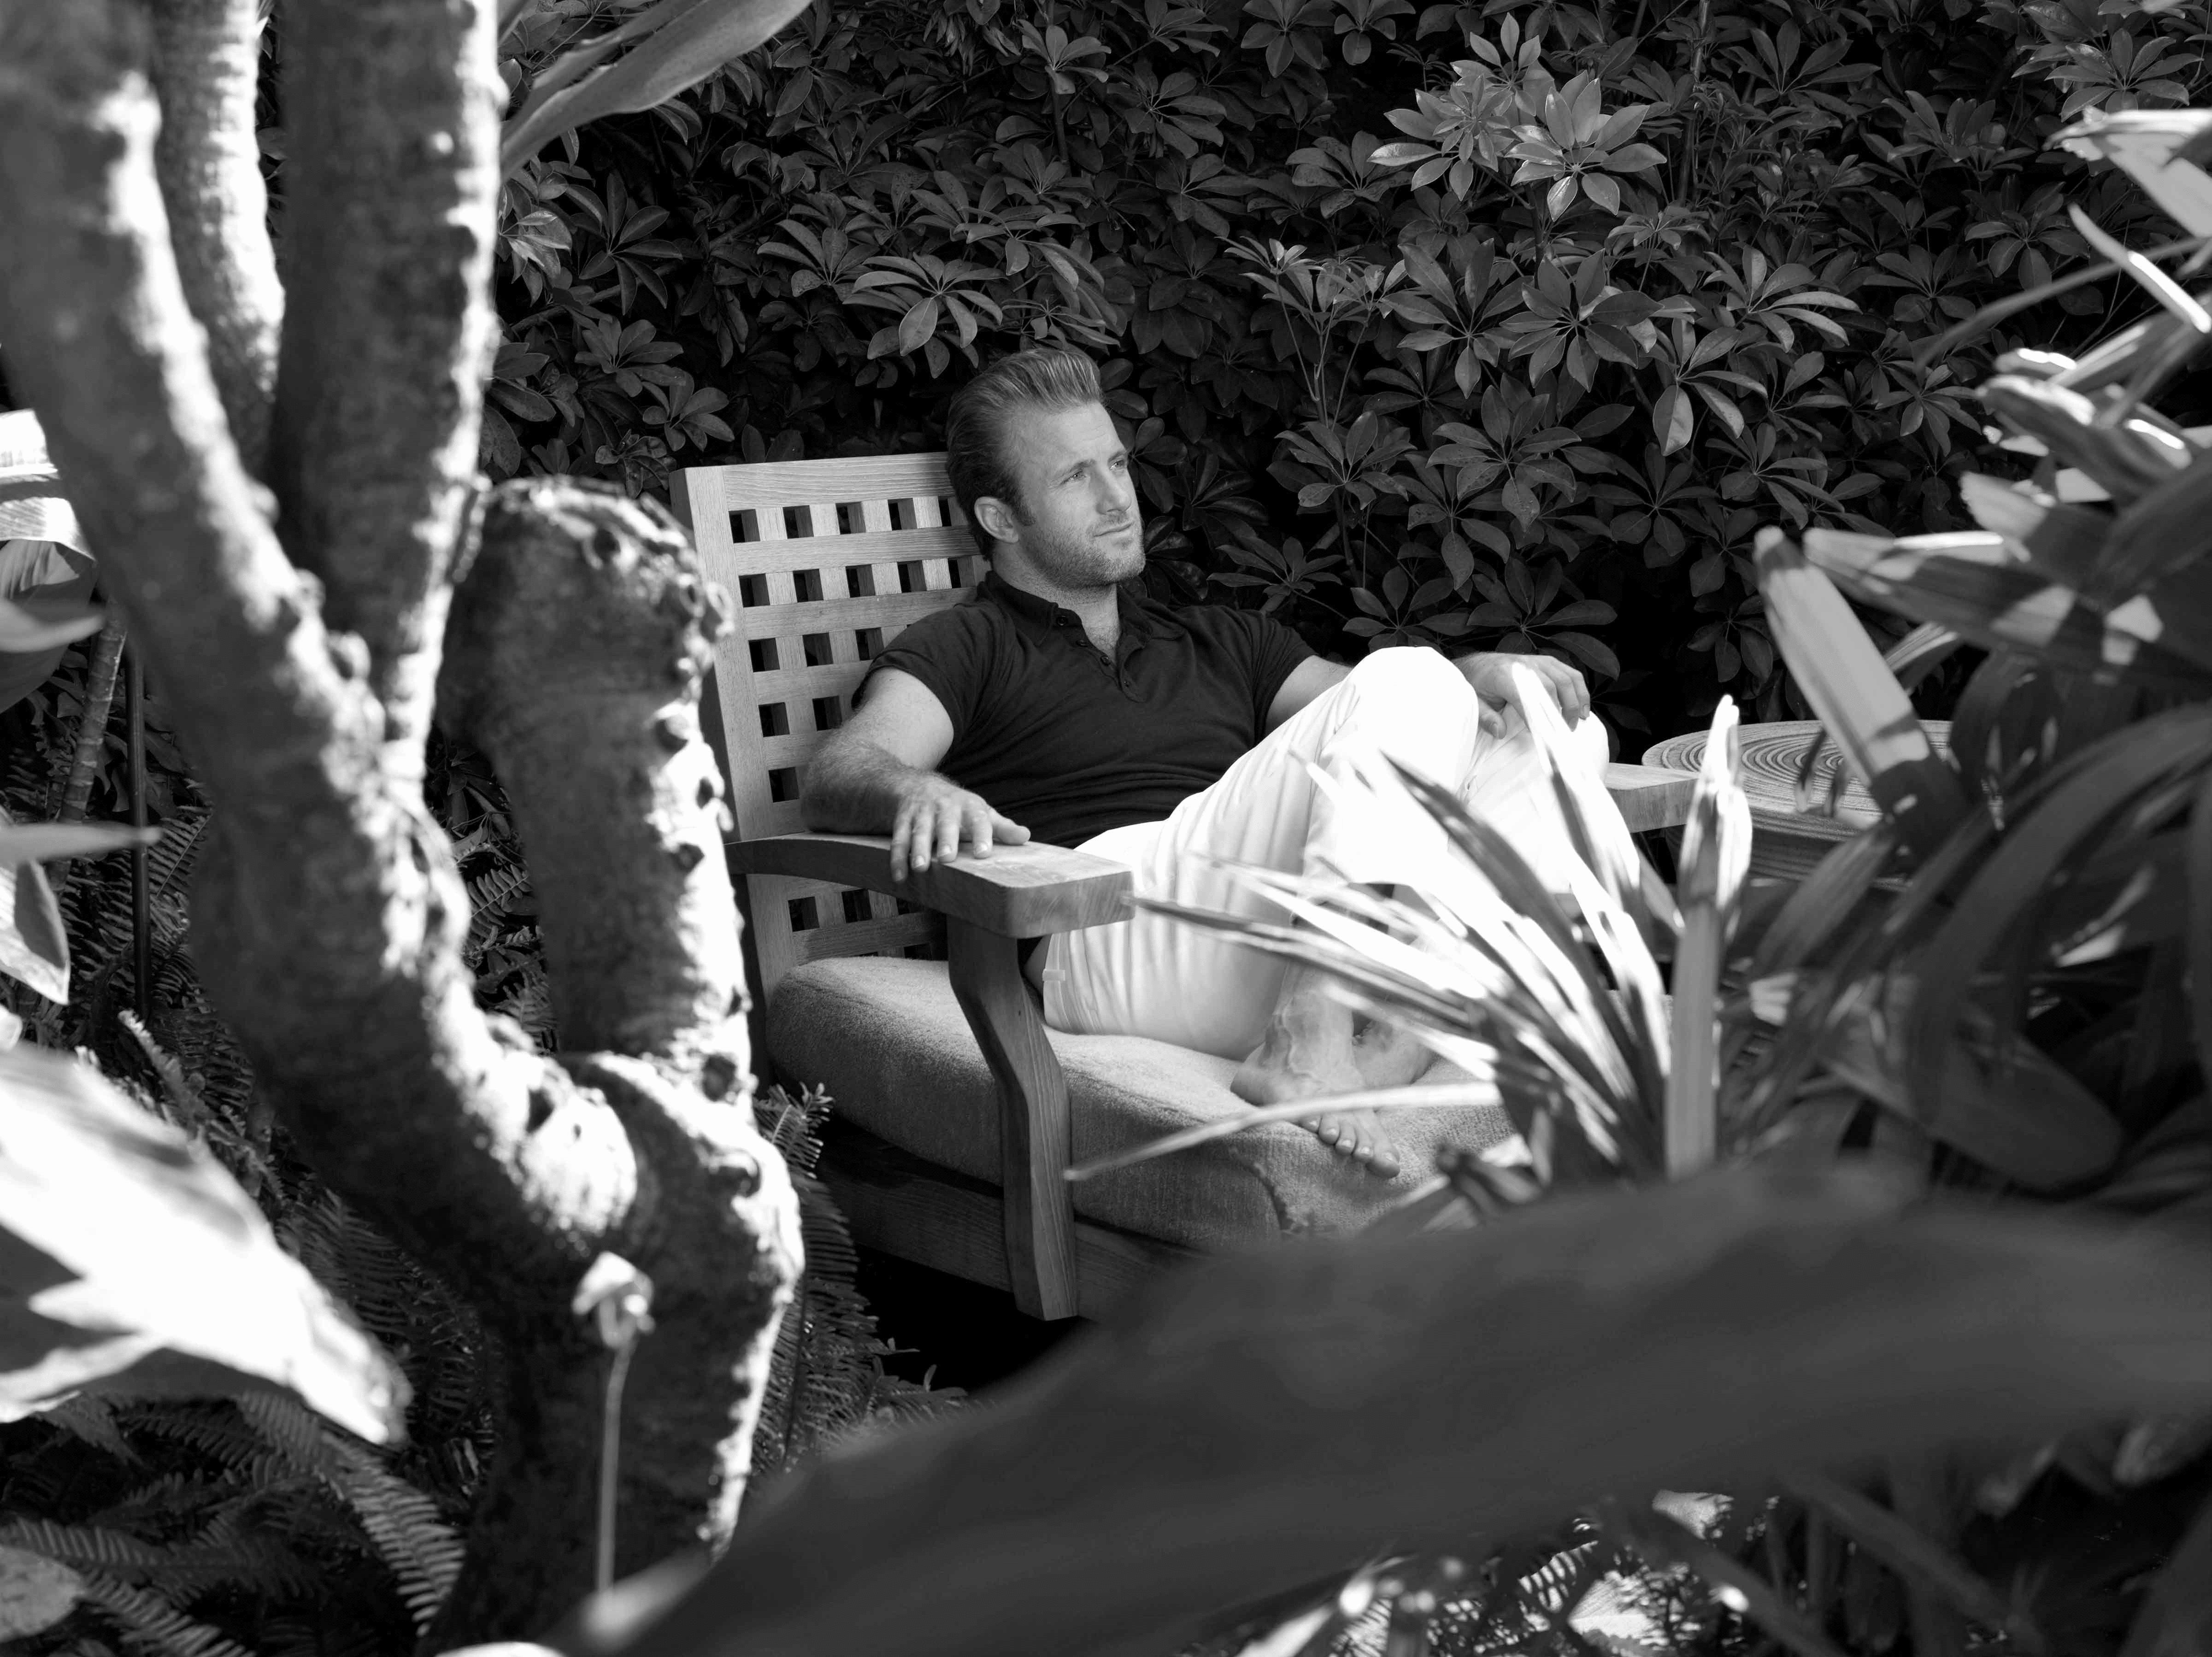 Black and white photo of Scott Caan sitting in a garden.